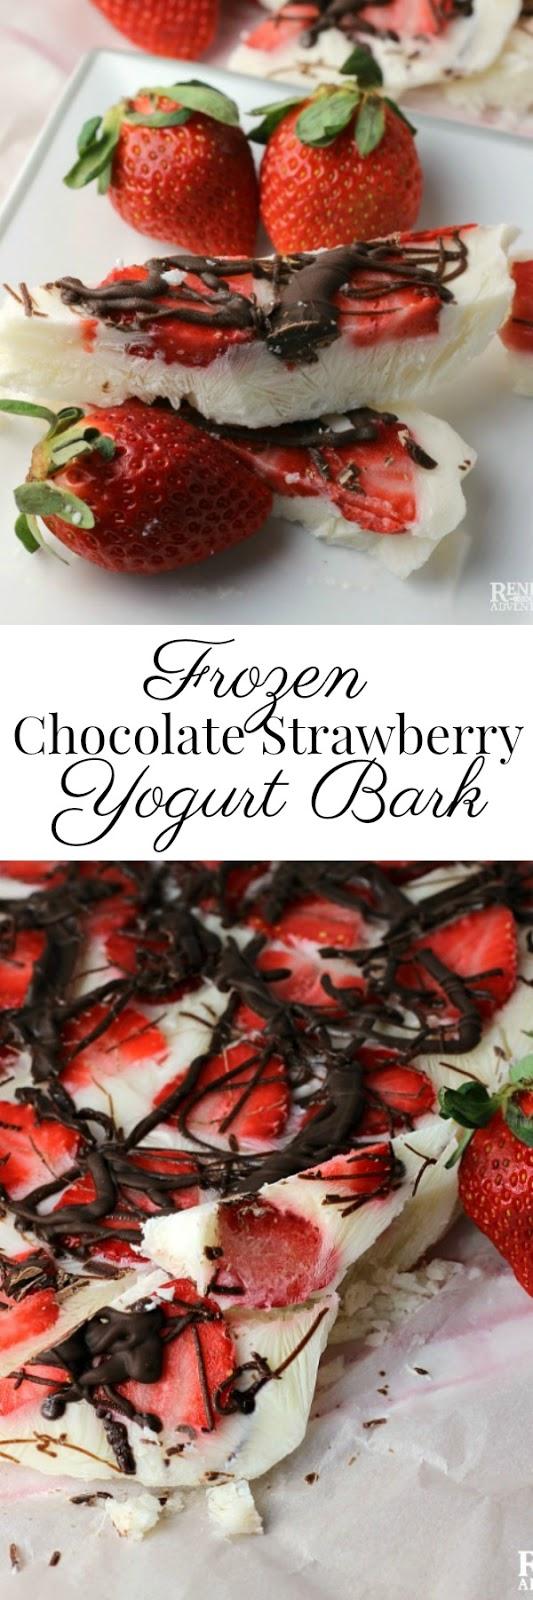 Frozen Strawberry Chocolate Yogurt Bark | Renee's Kitchen Adventures - Easy, healthy dessert or snack made with fresh Florida strawberries, yogurt, and dark chocolate @Flastrawberries #SundaySupper #FLStrawberry #healthysnack #healthyrecipe